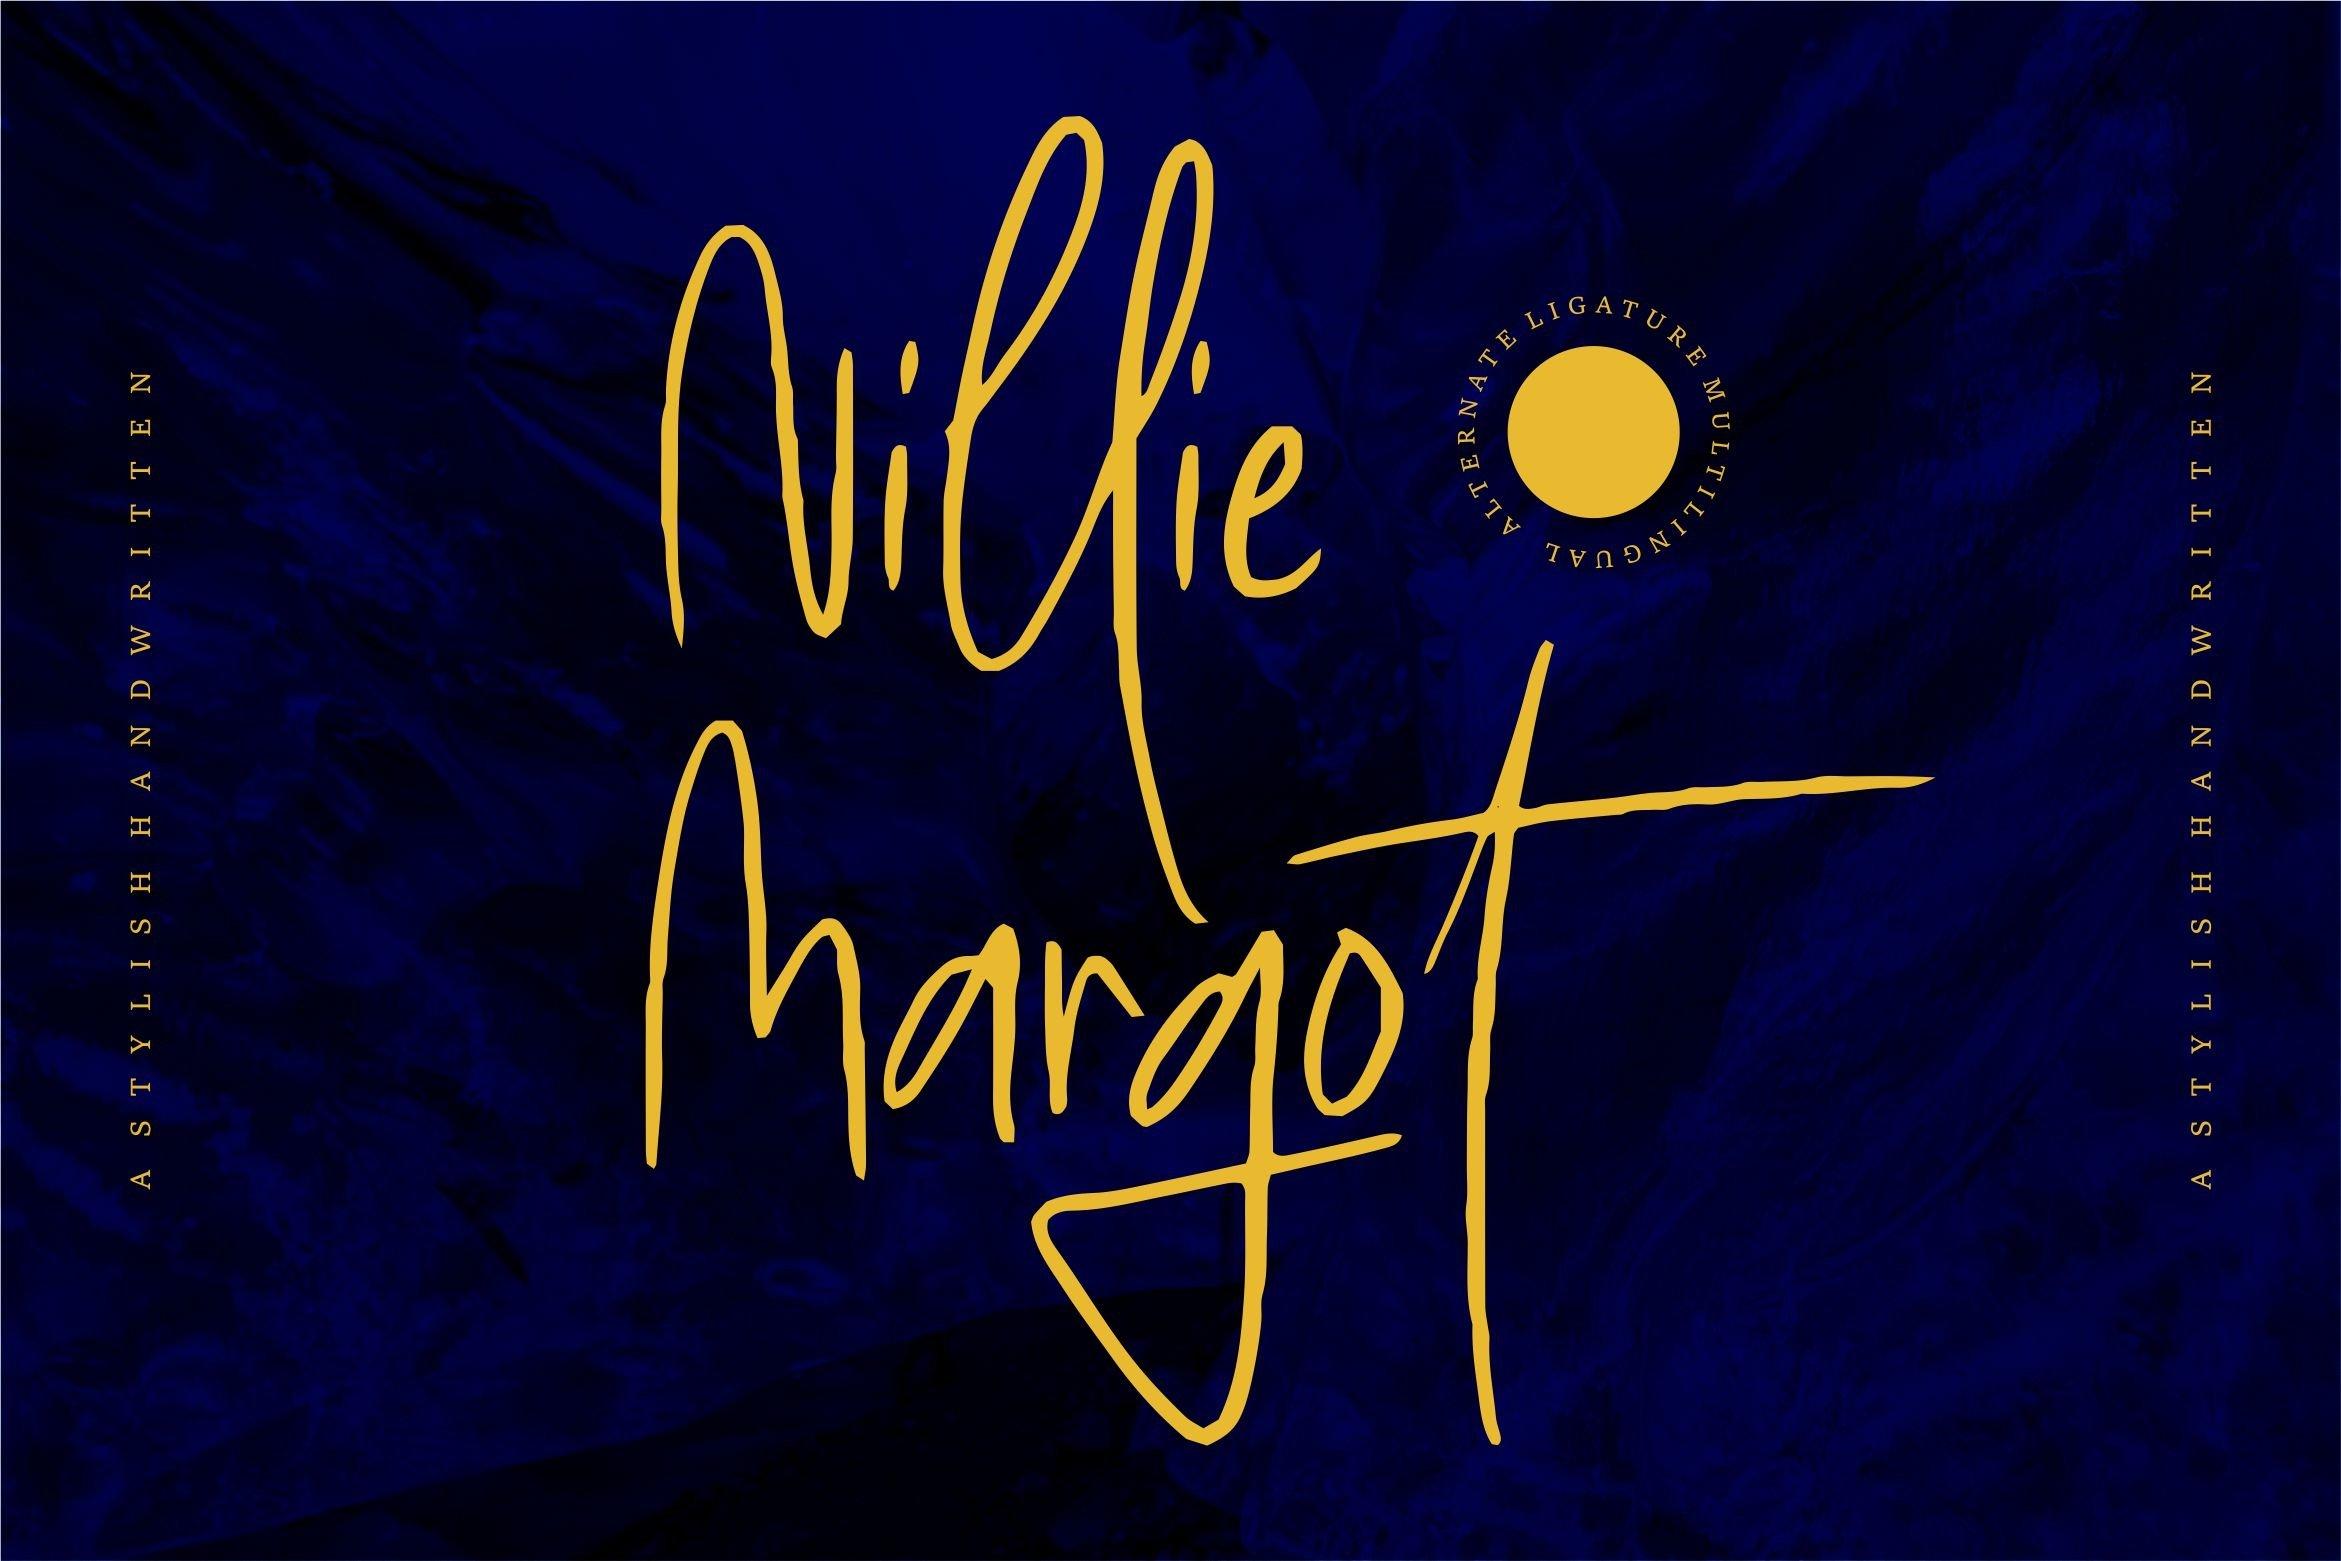 Nillie Margot - Stylish Handwritten example image 1